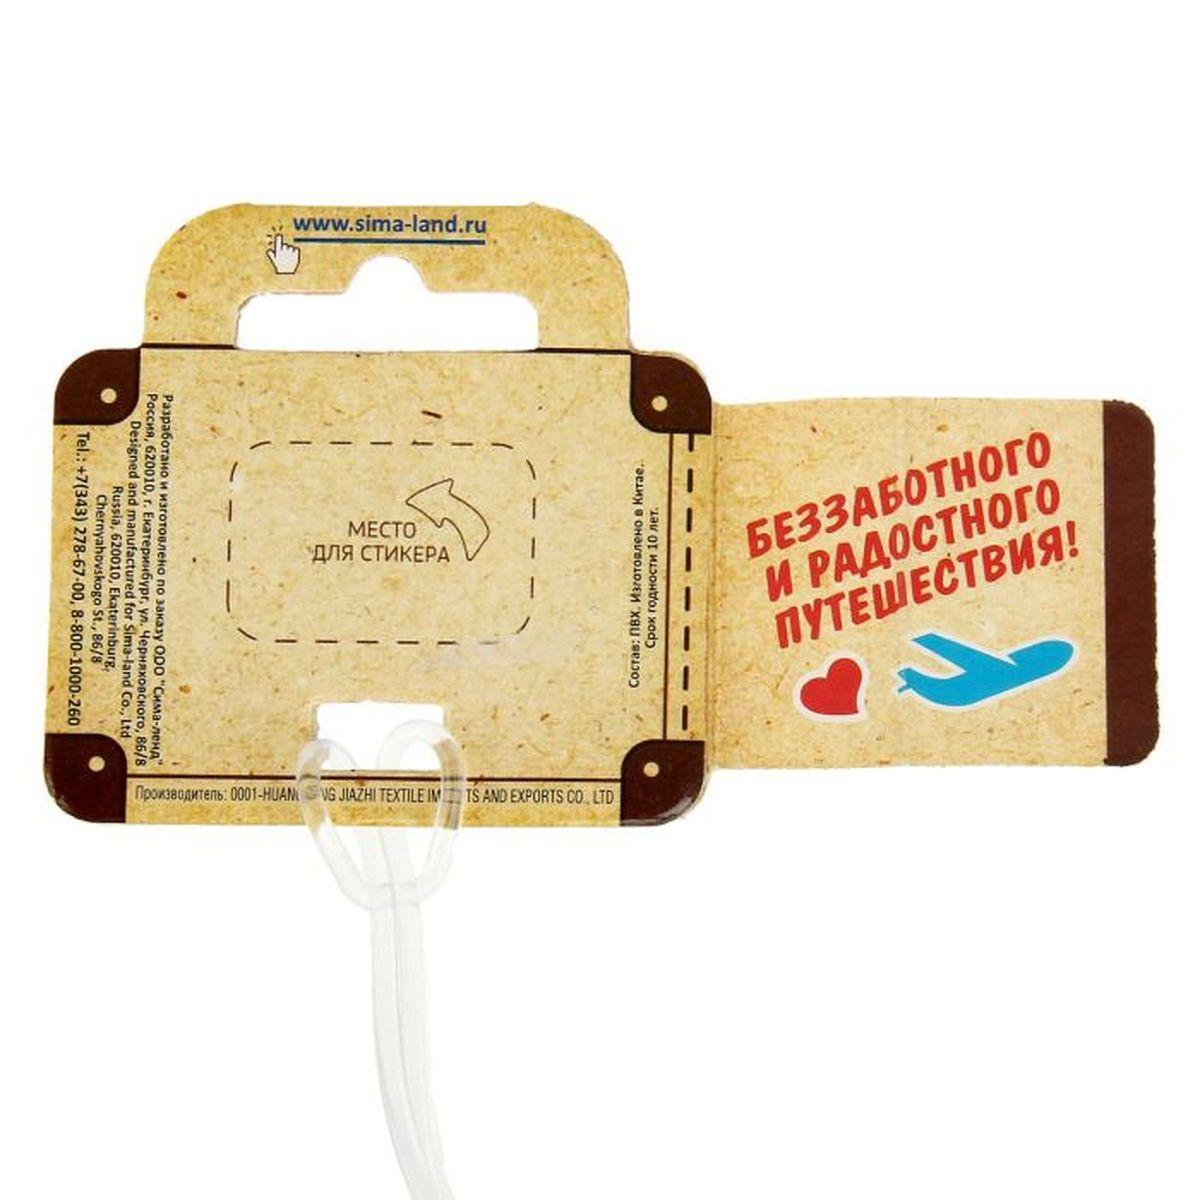 "Бирка на чемодан Sima-land ""Улетные вещи"", 6,5 х 11 см. 1156273"